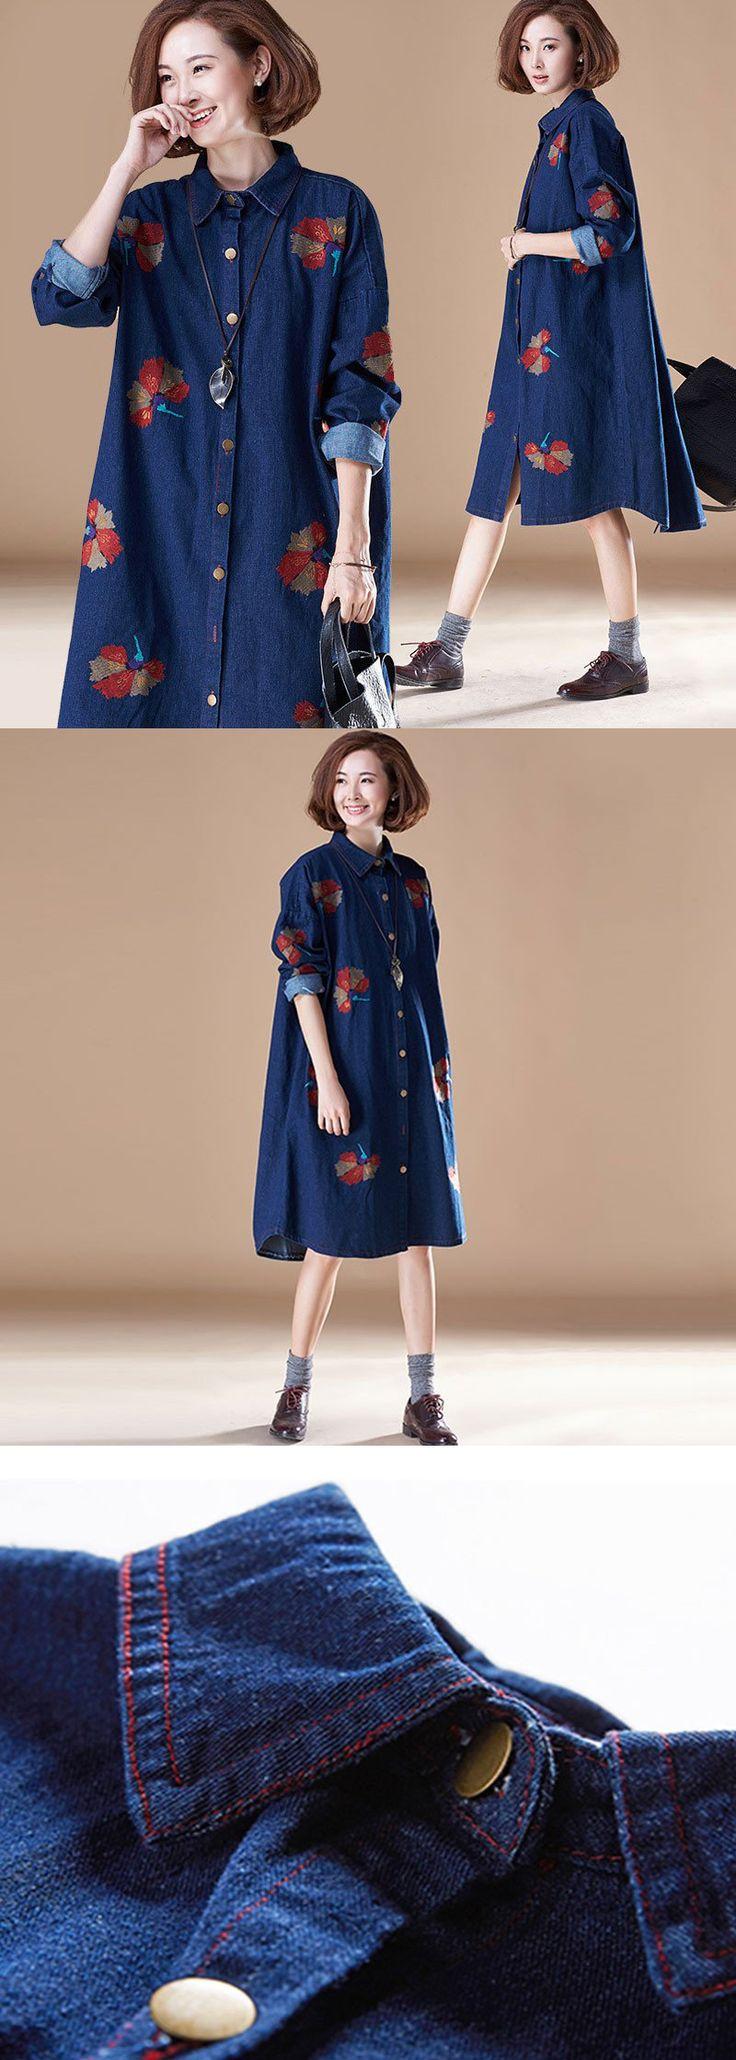 Embroidered Denim Dress More